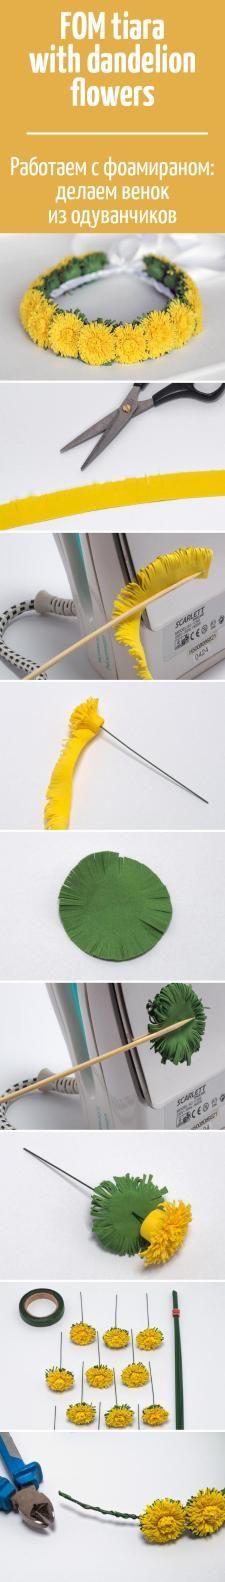 Bijoux Idées d'artisanat - Pandahall.com